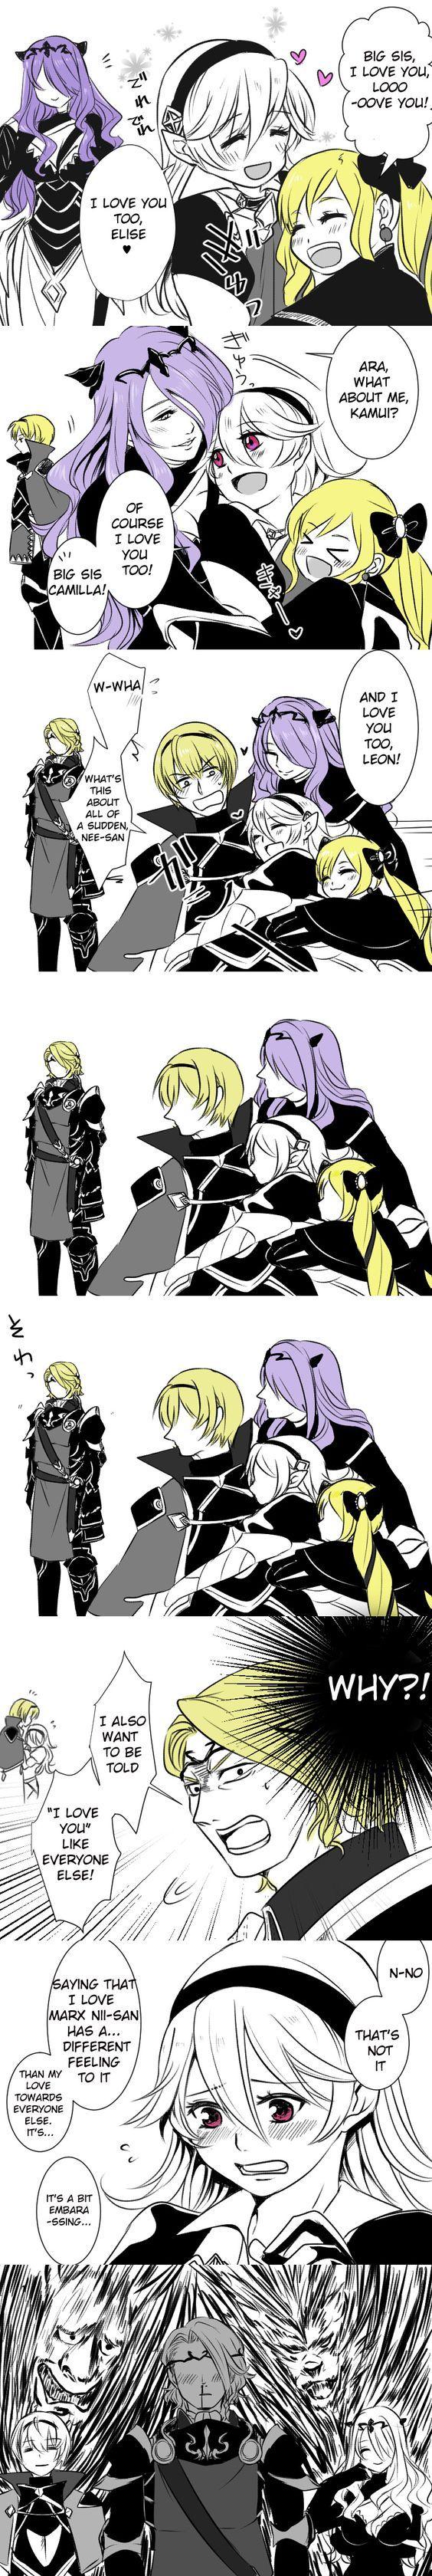 Fire Emblem: If/Fates - Kamui, Leon, Camilla, Elise and Xander